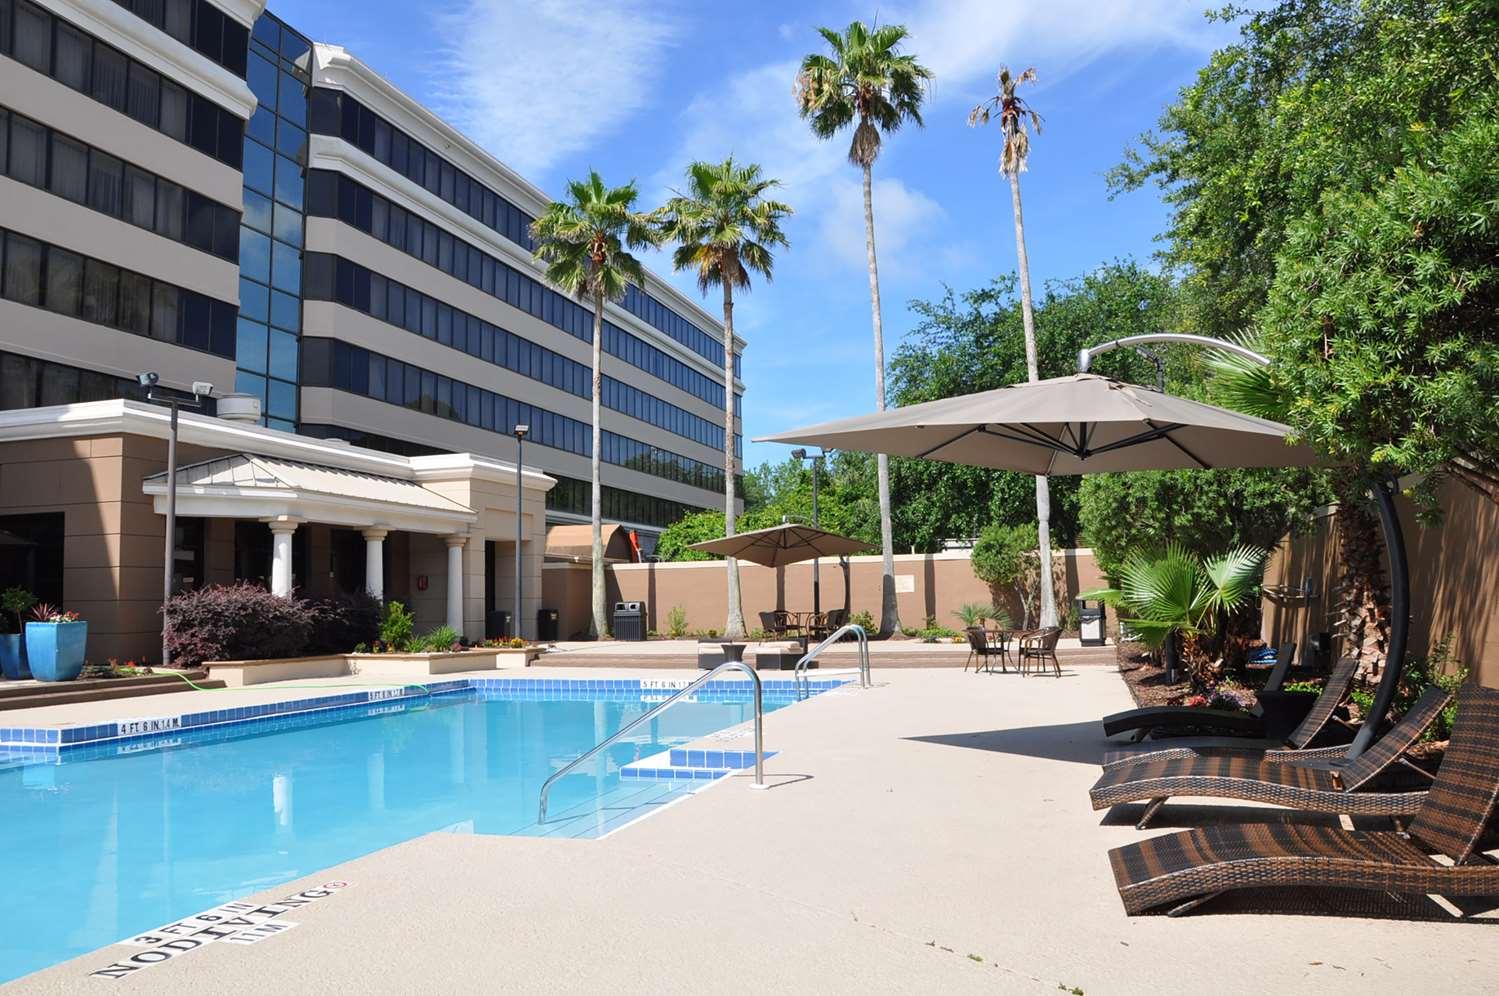 Pool - Best Western Premier Hotel Jacksonville